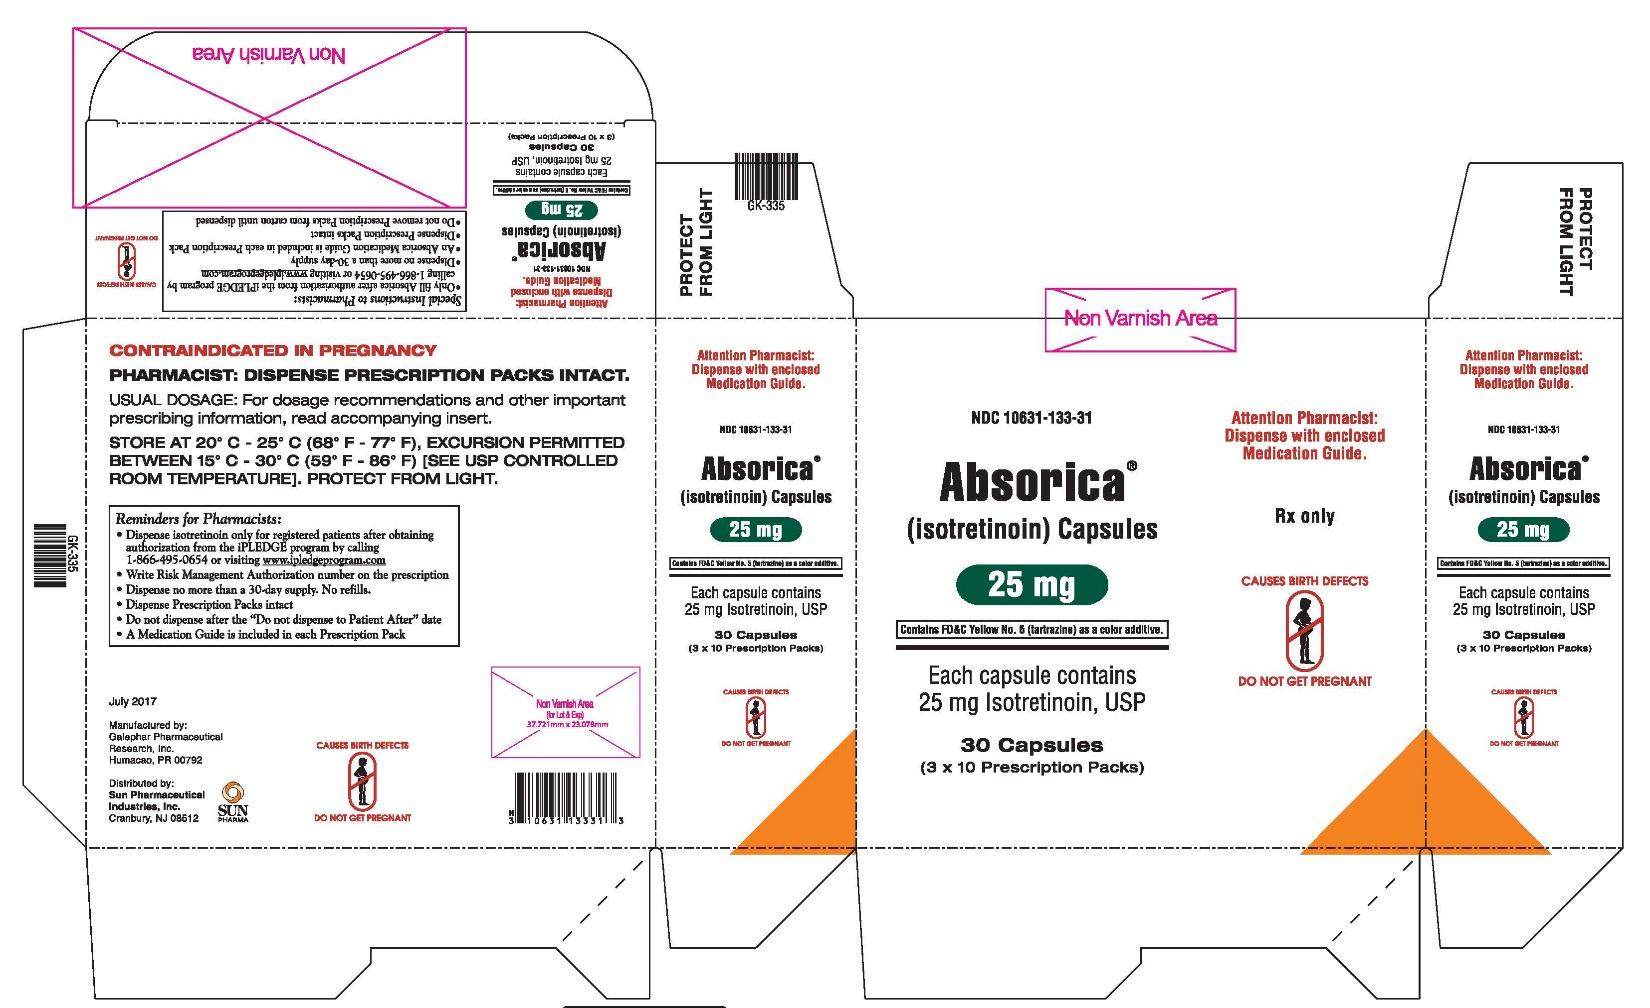 Absorica 25 mg Carton